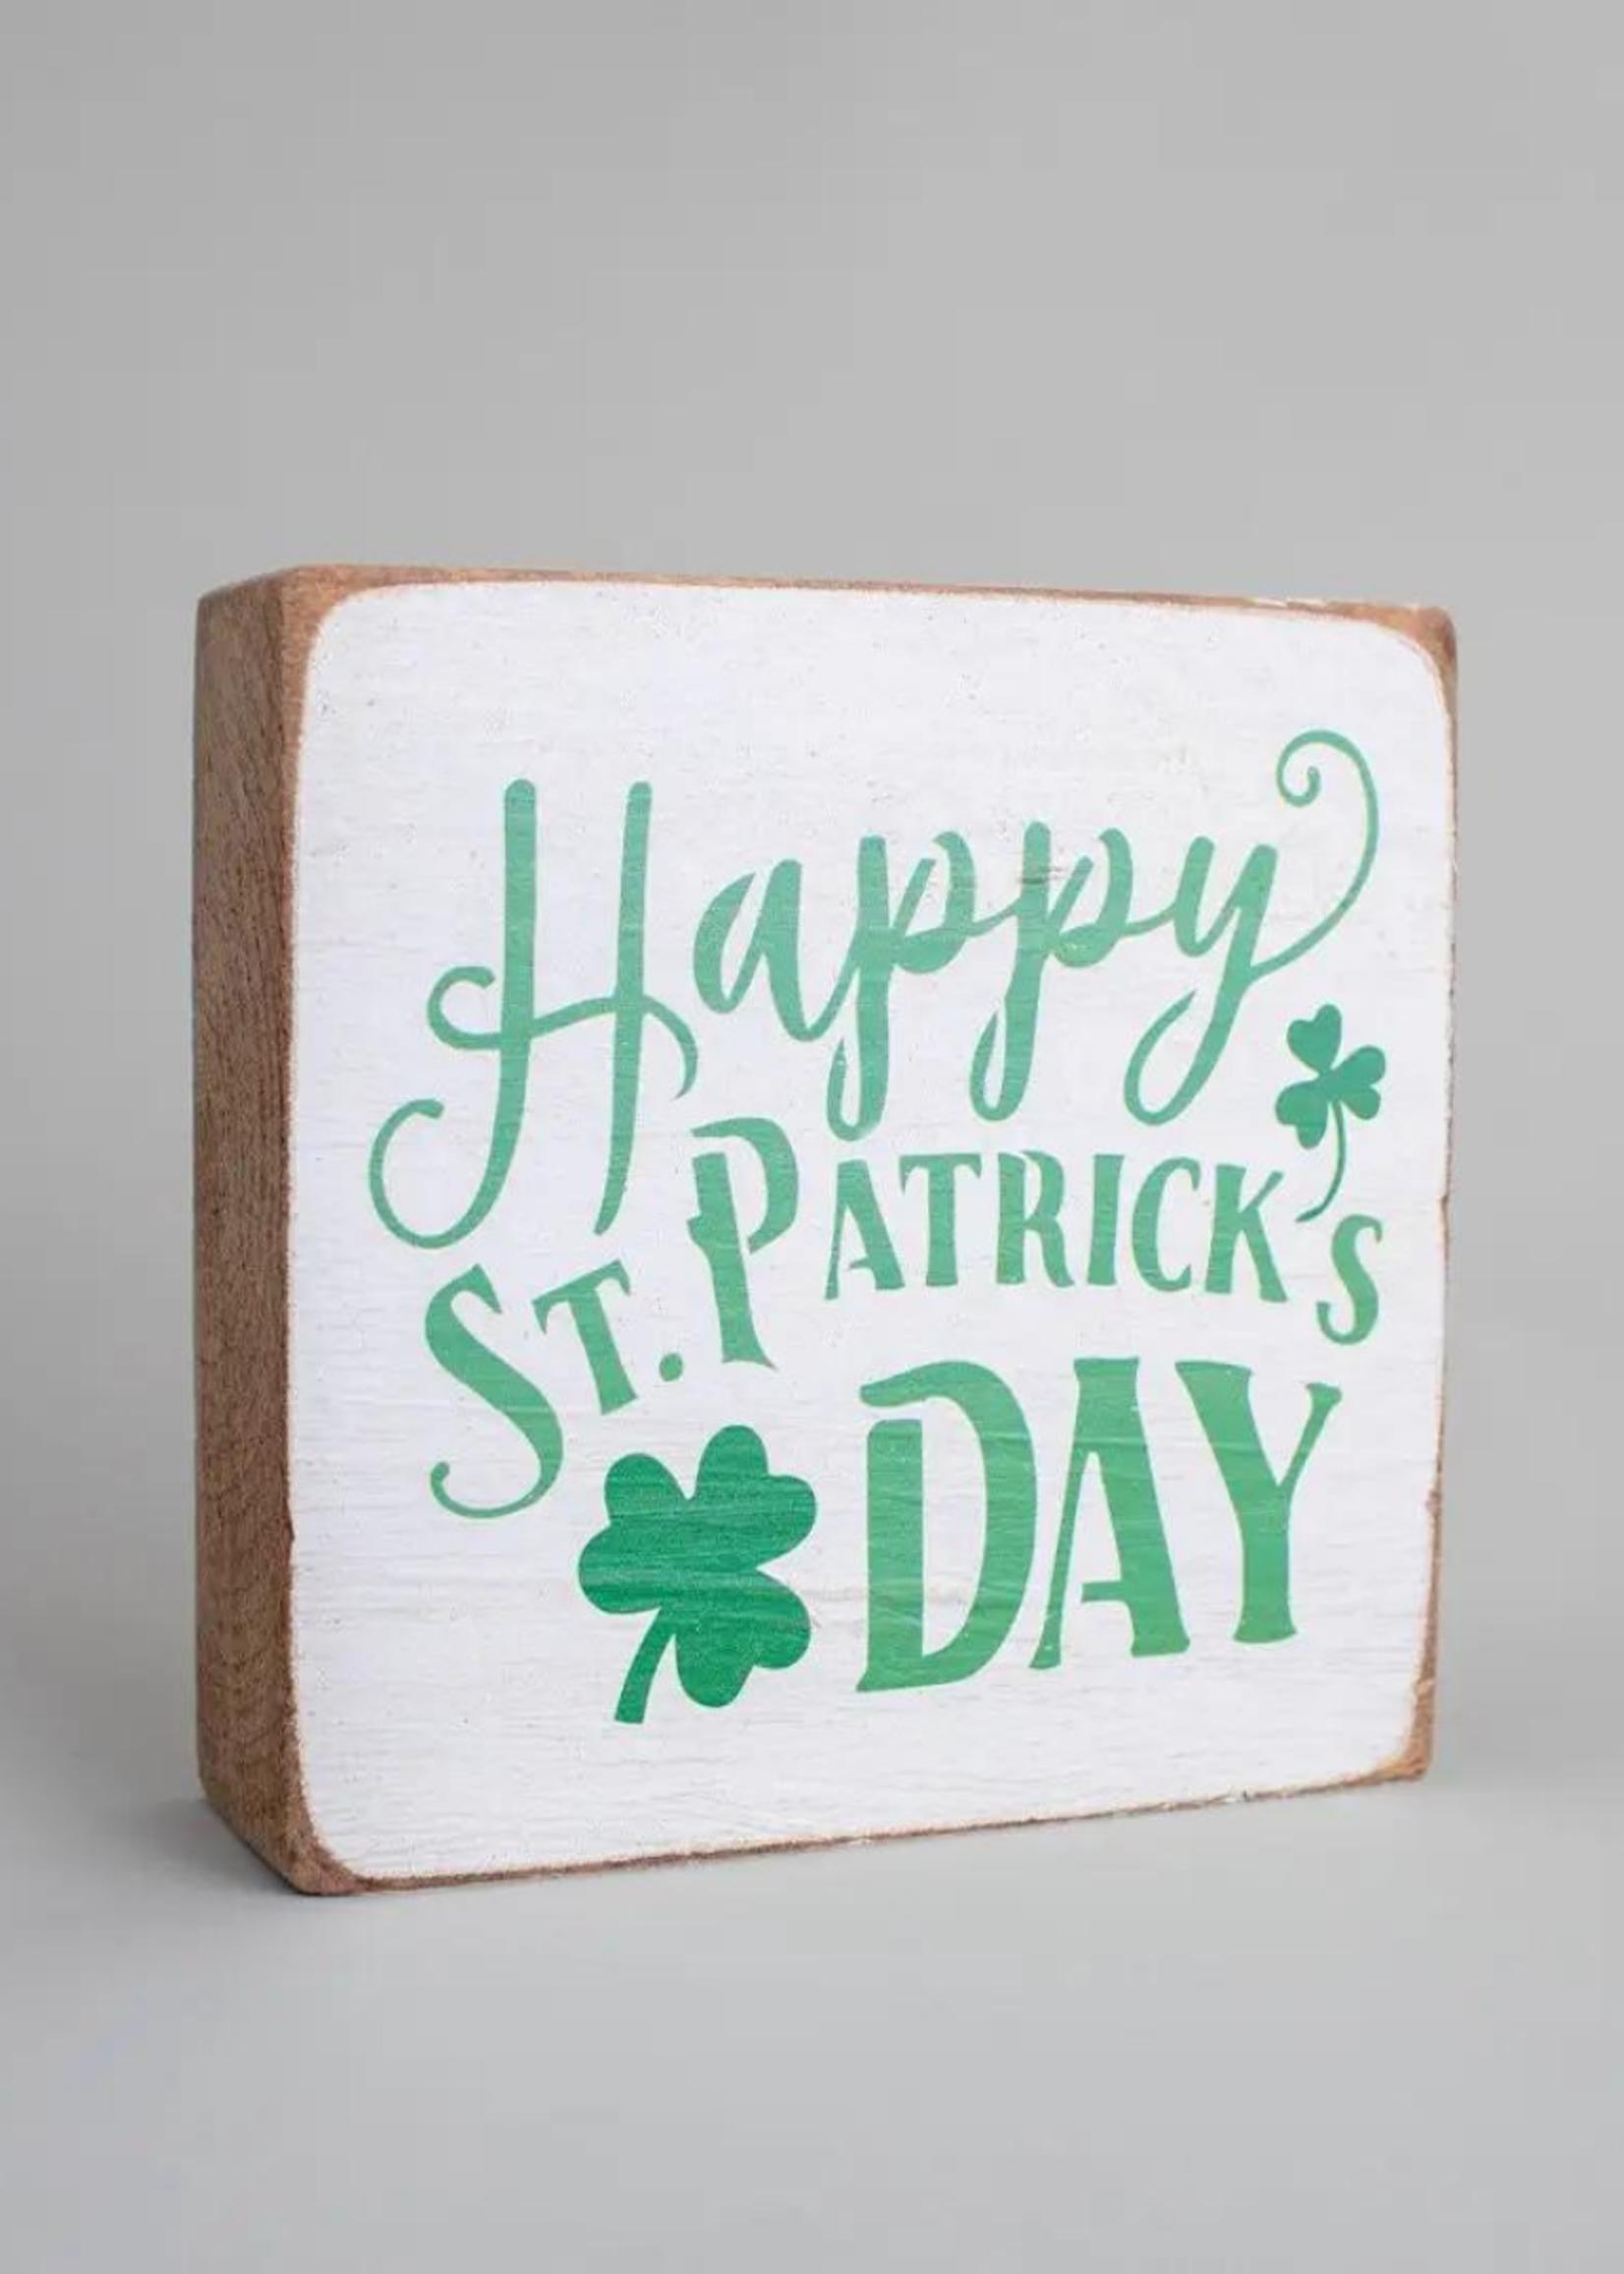 Rustic Marlin Happy St. Patrick's Day Decorative Wooden Block